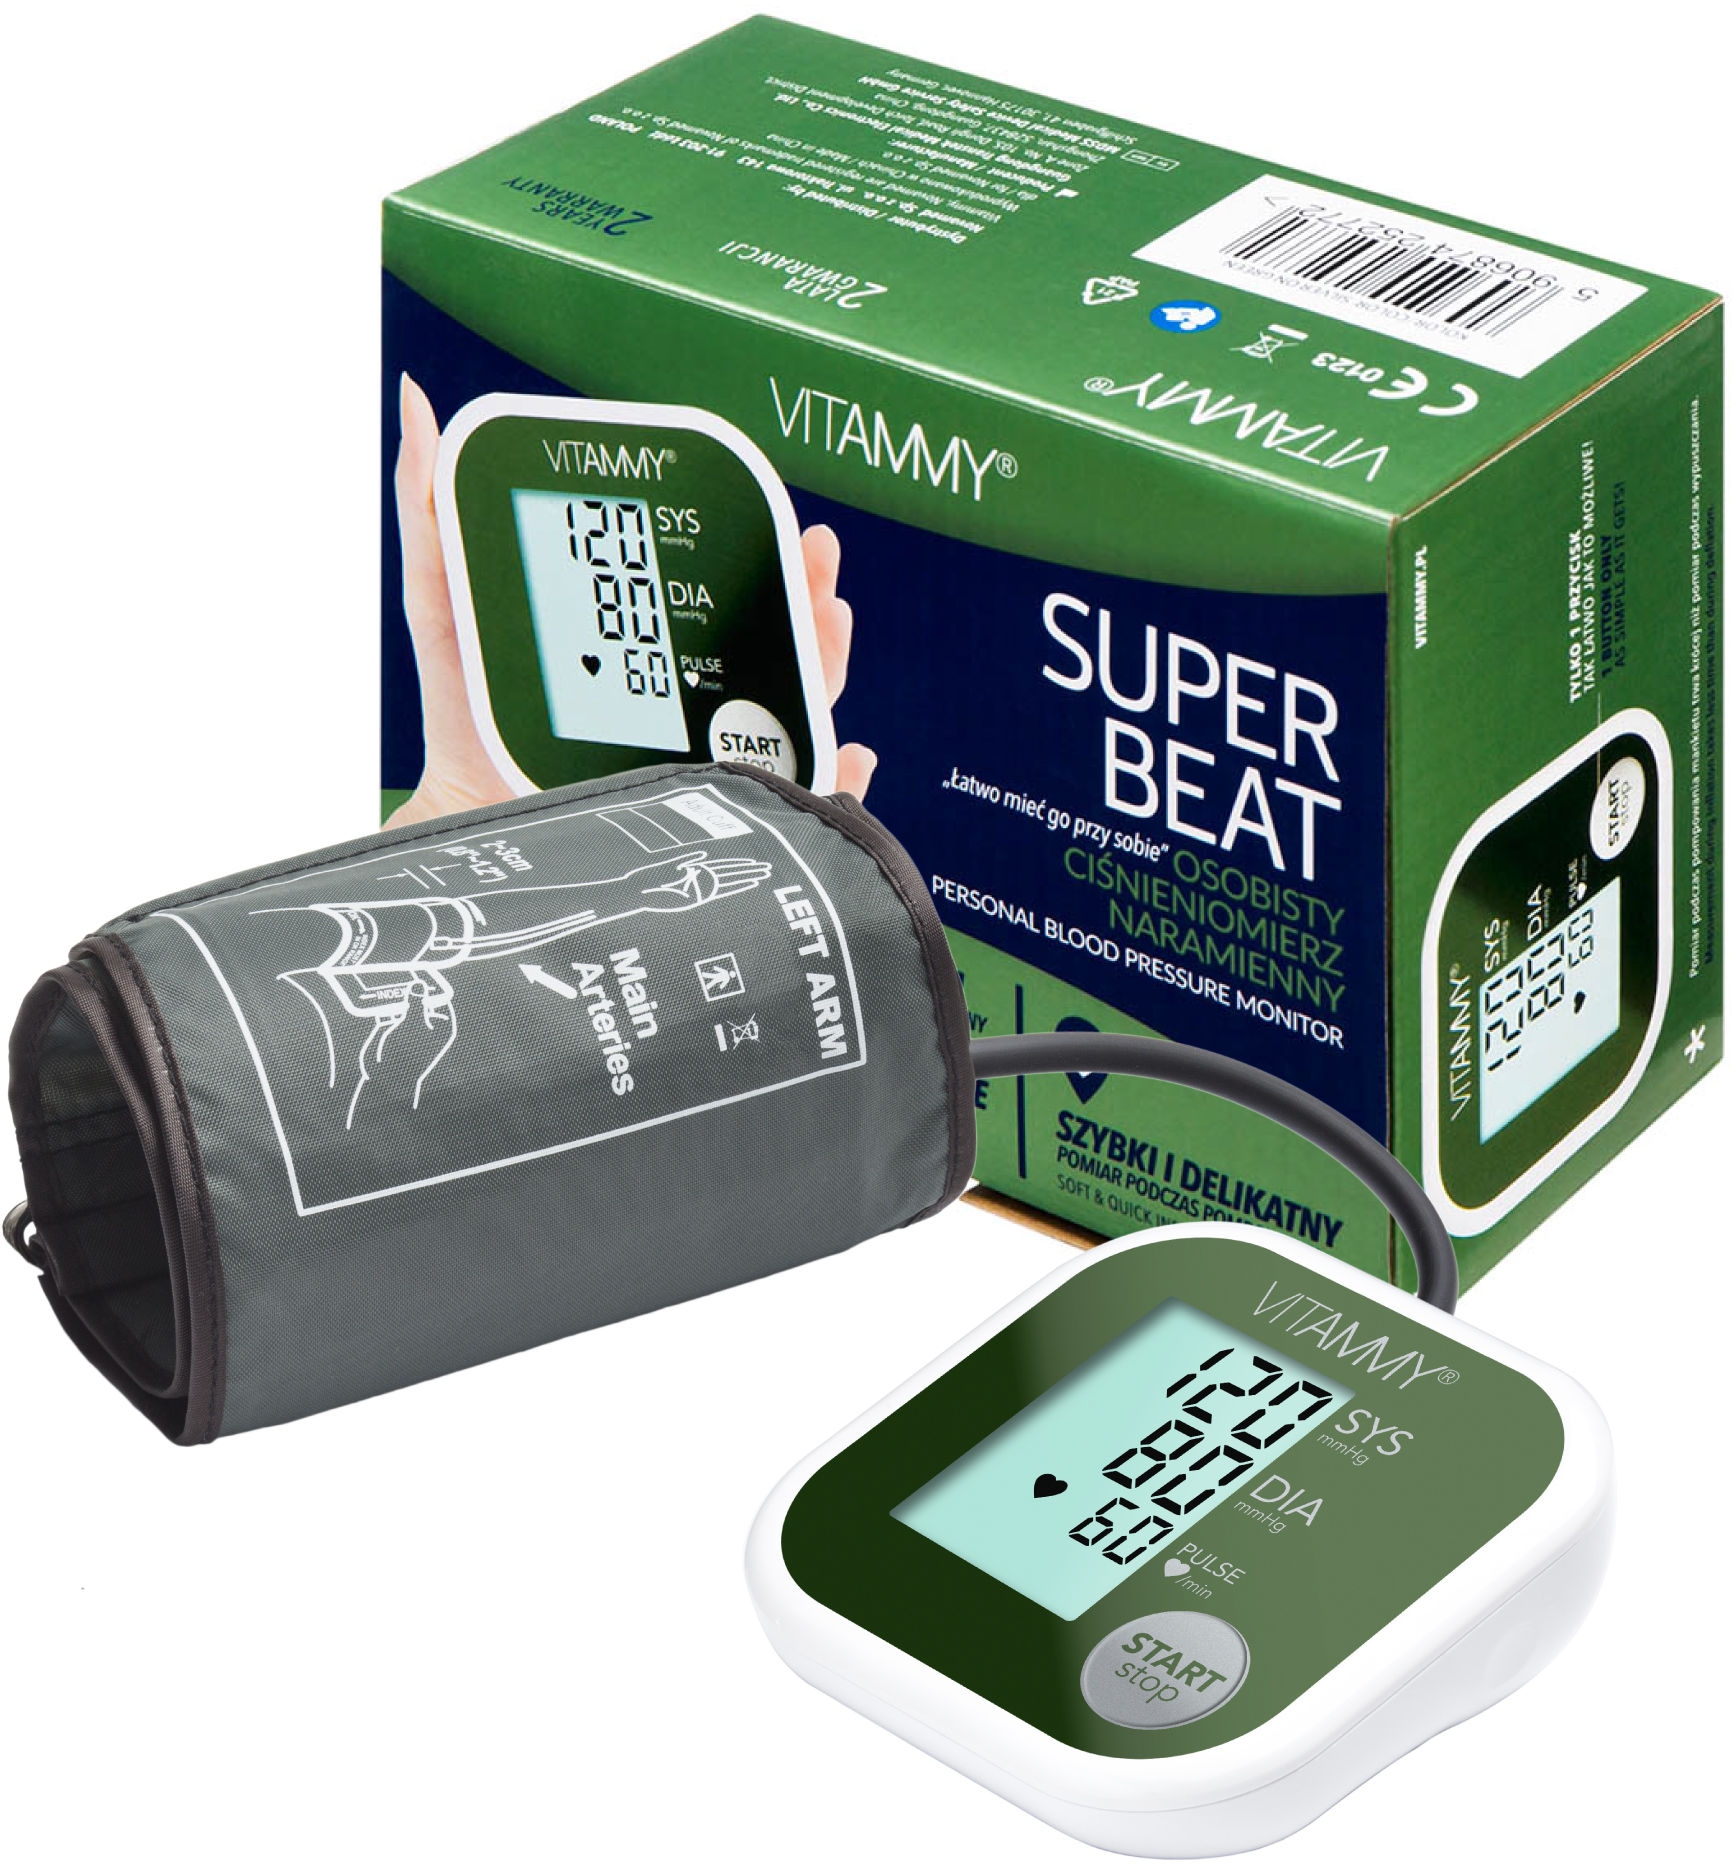 VITAMMY Super Beat Silver on Green Ciśnieniomierz naramienny 22-42 cm